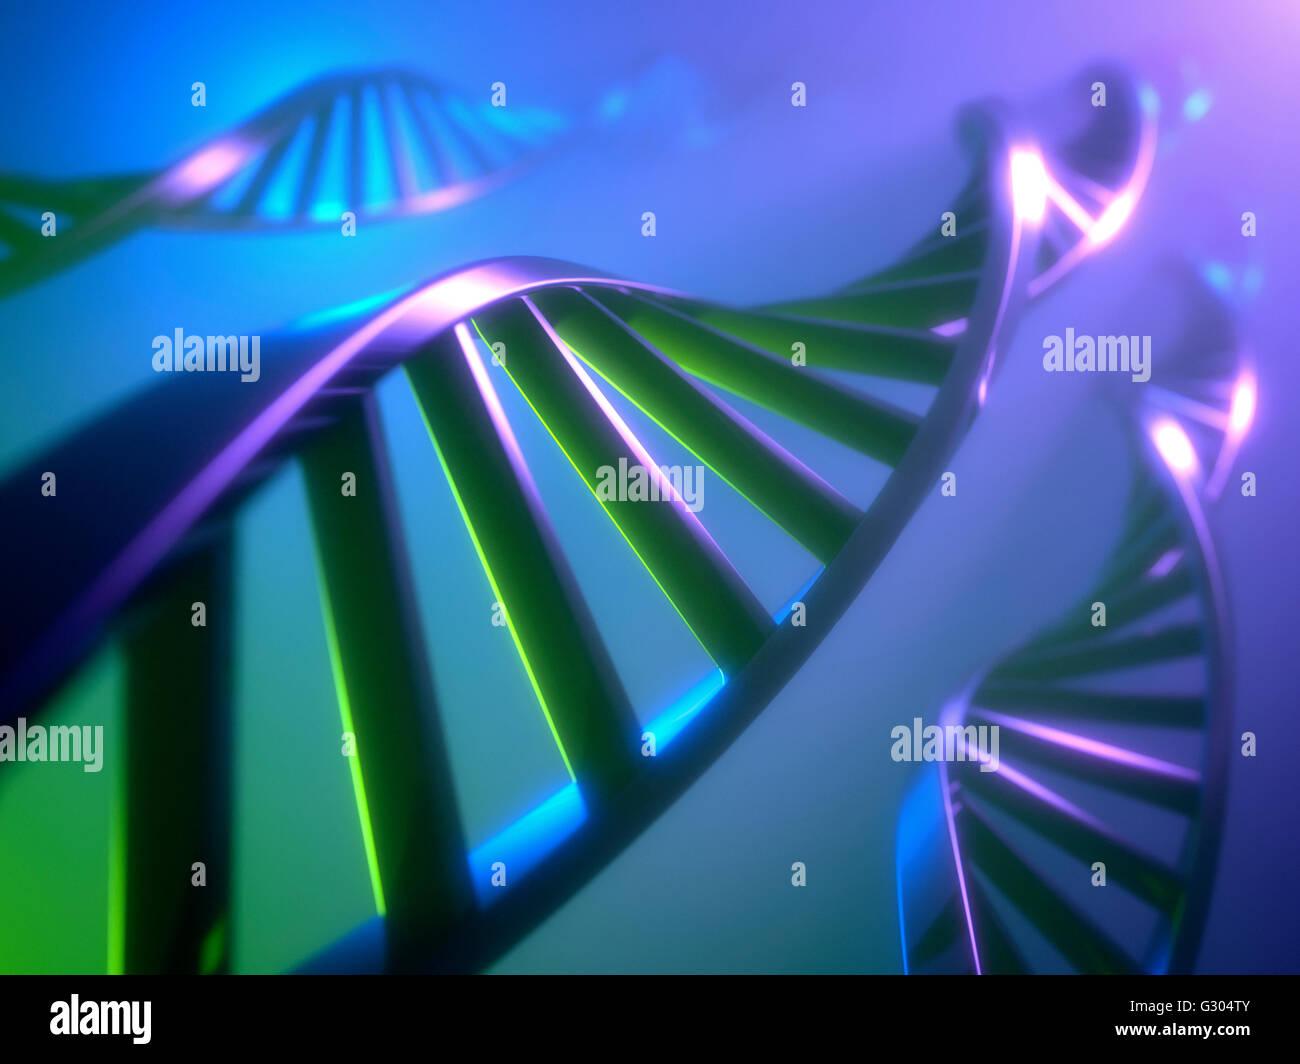 Dna (deoxyribonucleic acid) strand, illustration. - Stock Image